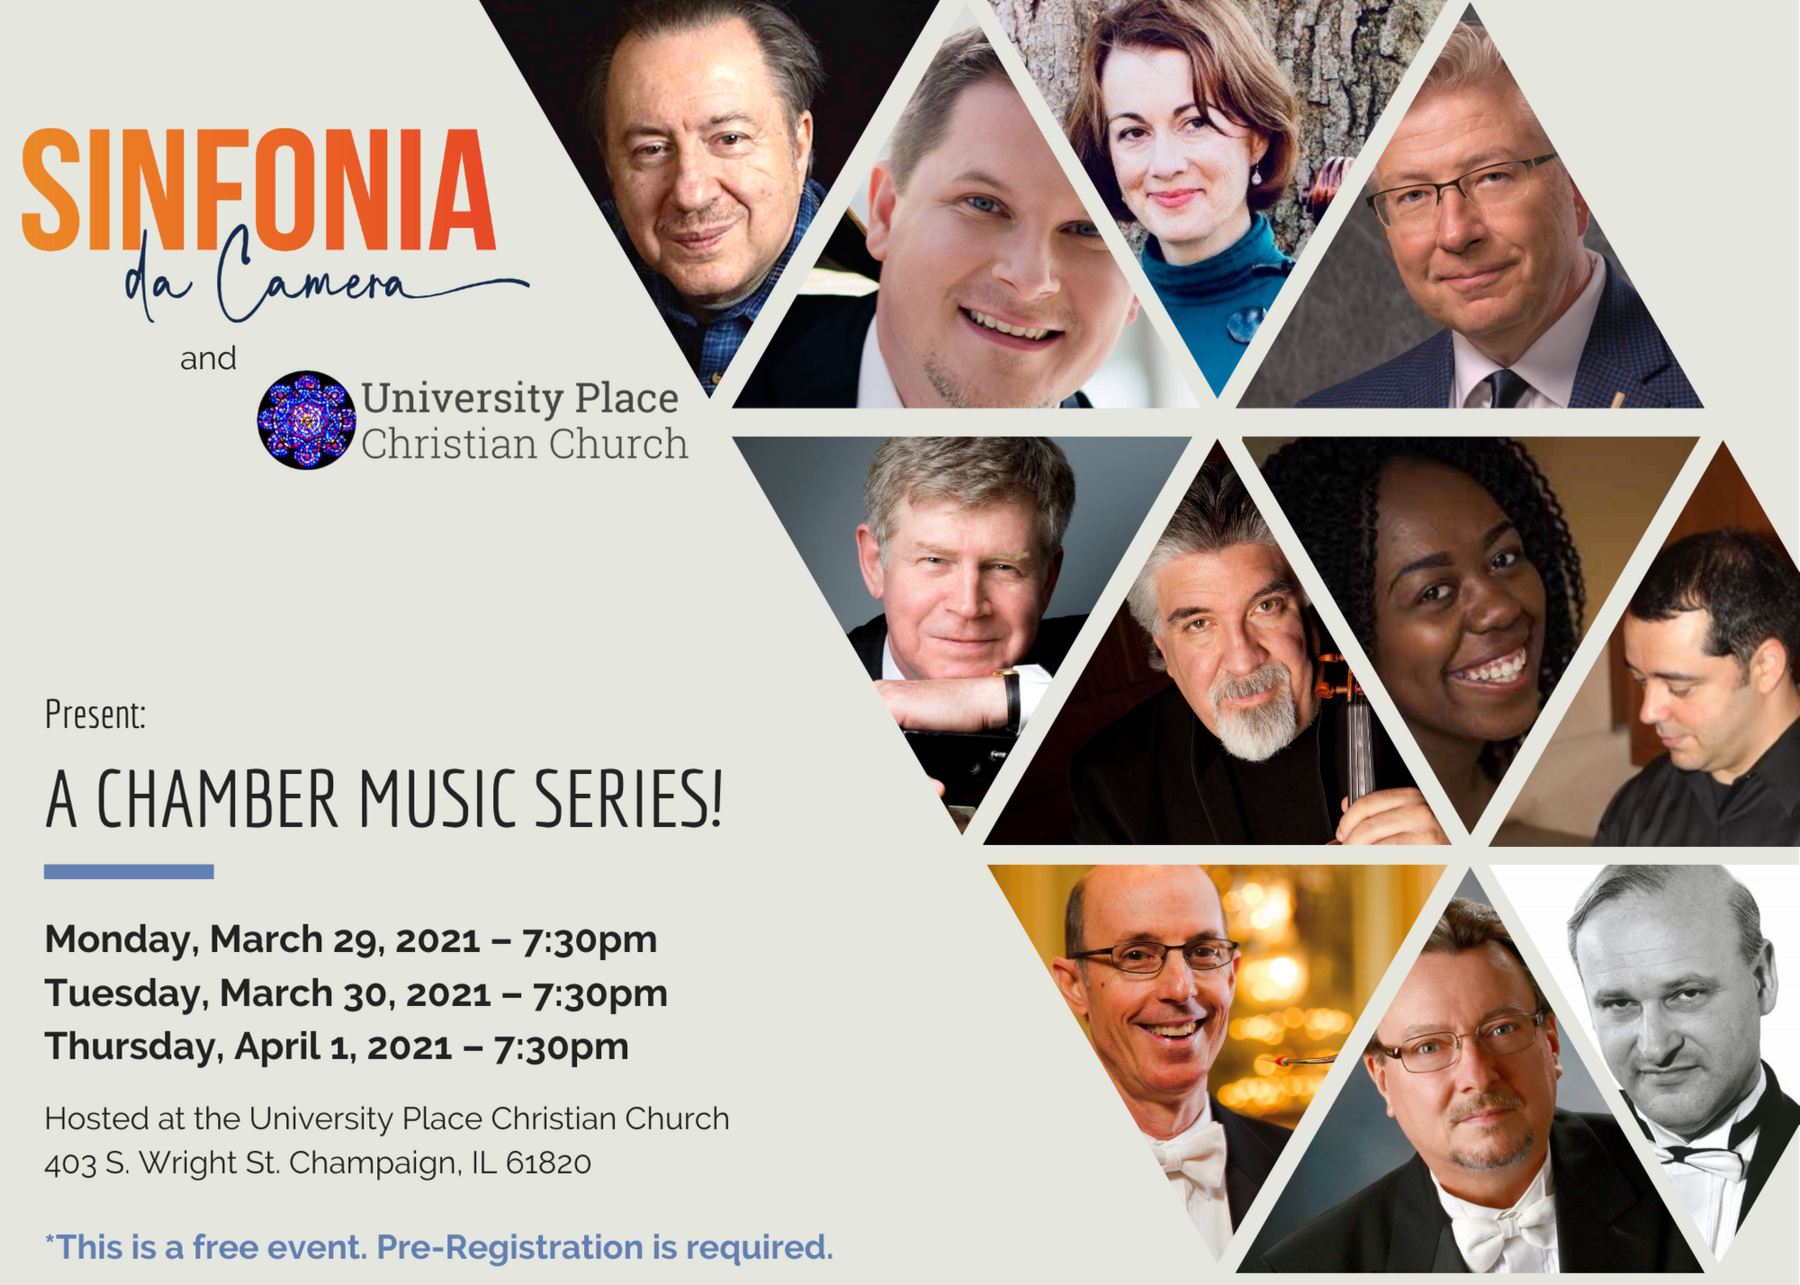 Sinfonia da Camera Presents: A Chamber Music Series!